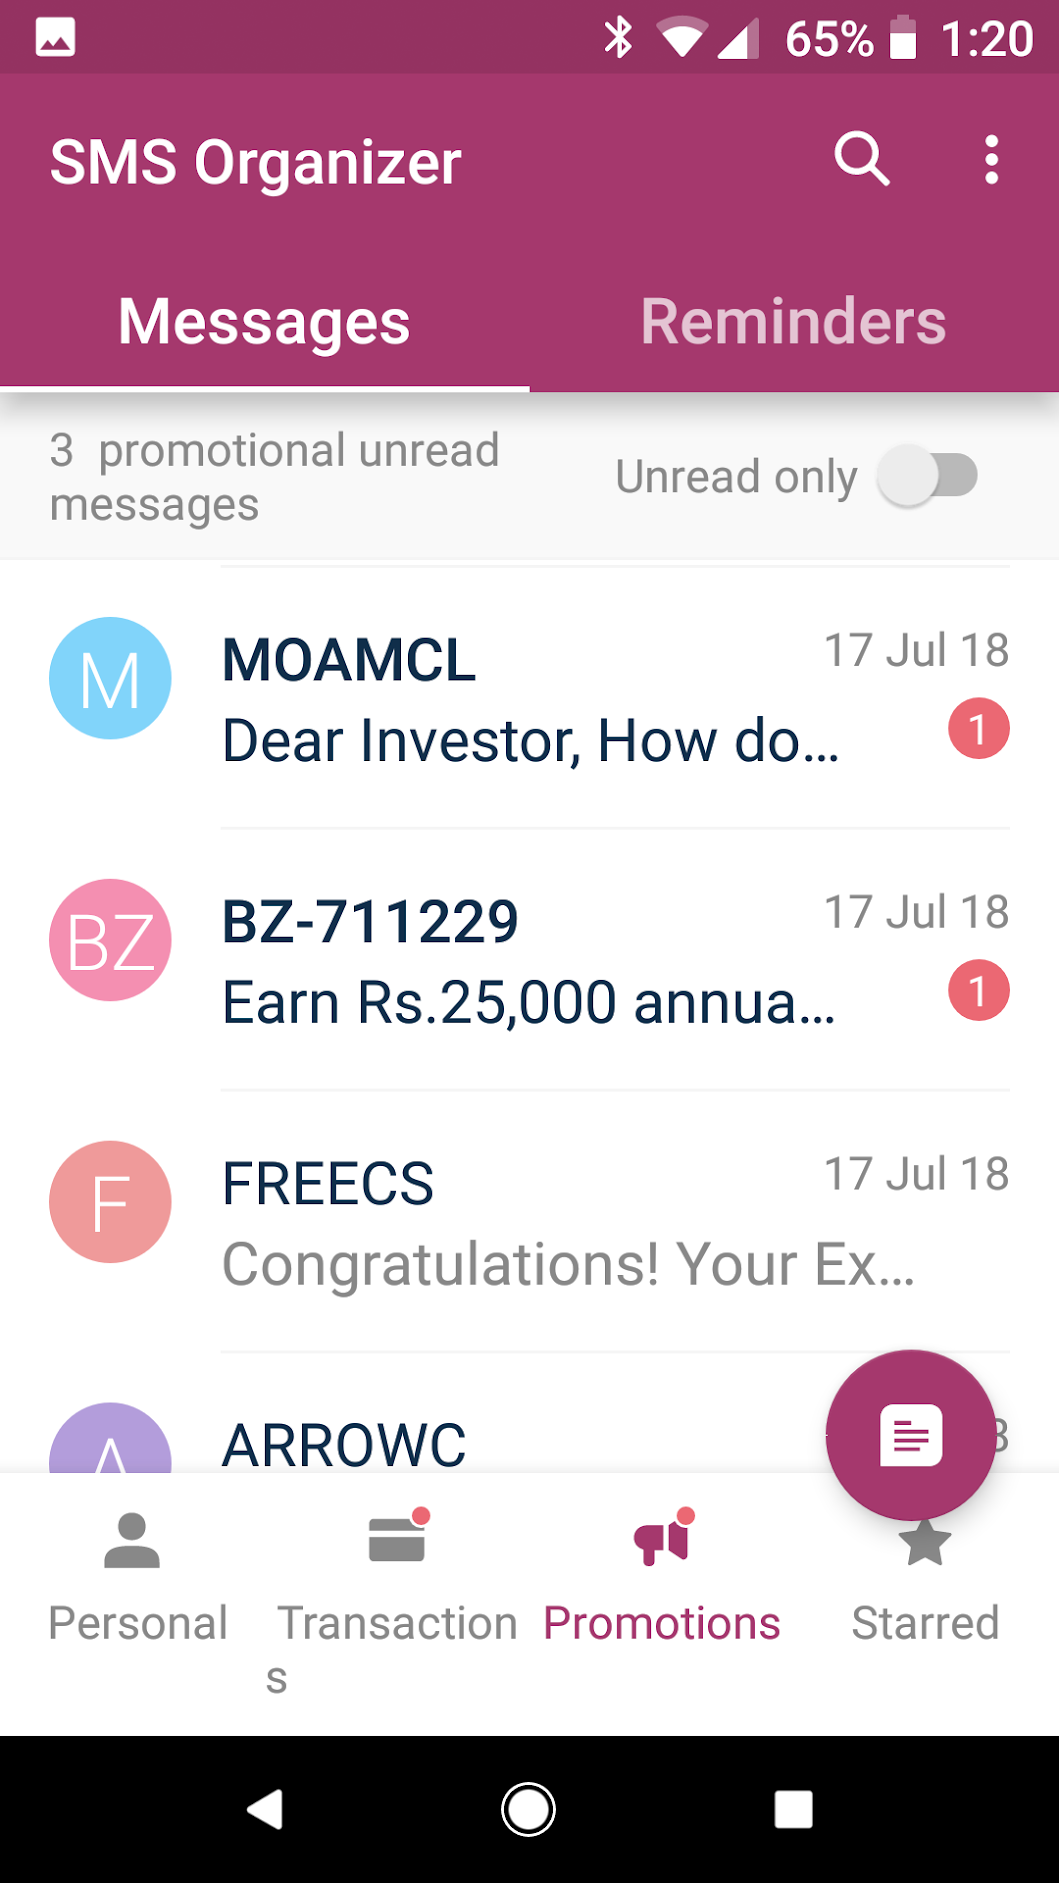 Promotions Tab - Microsoft SMS Organizer